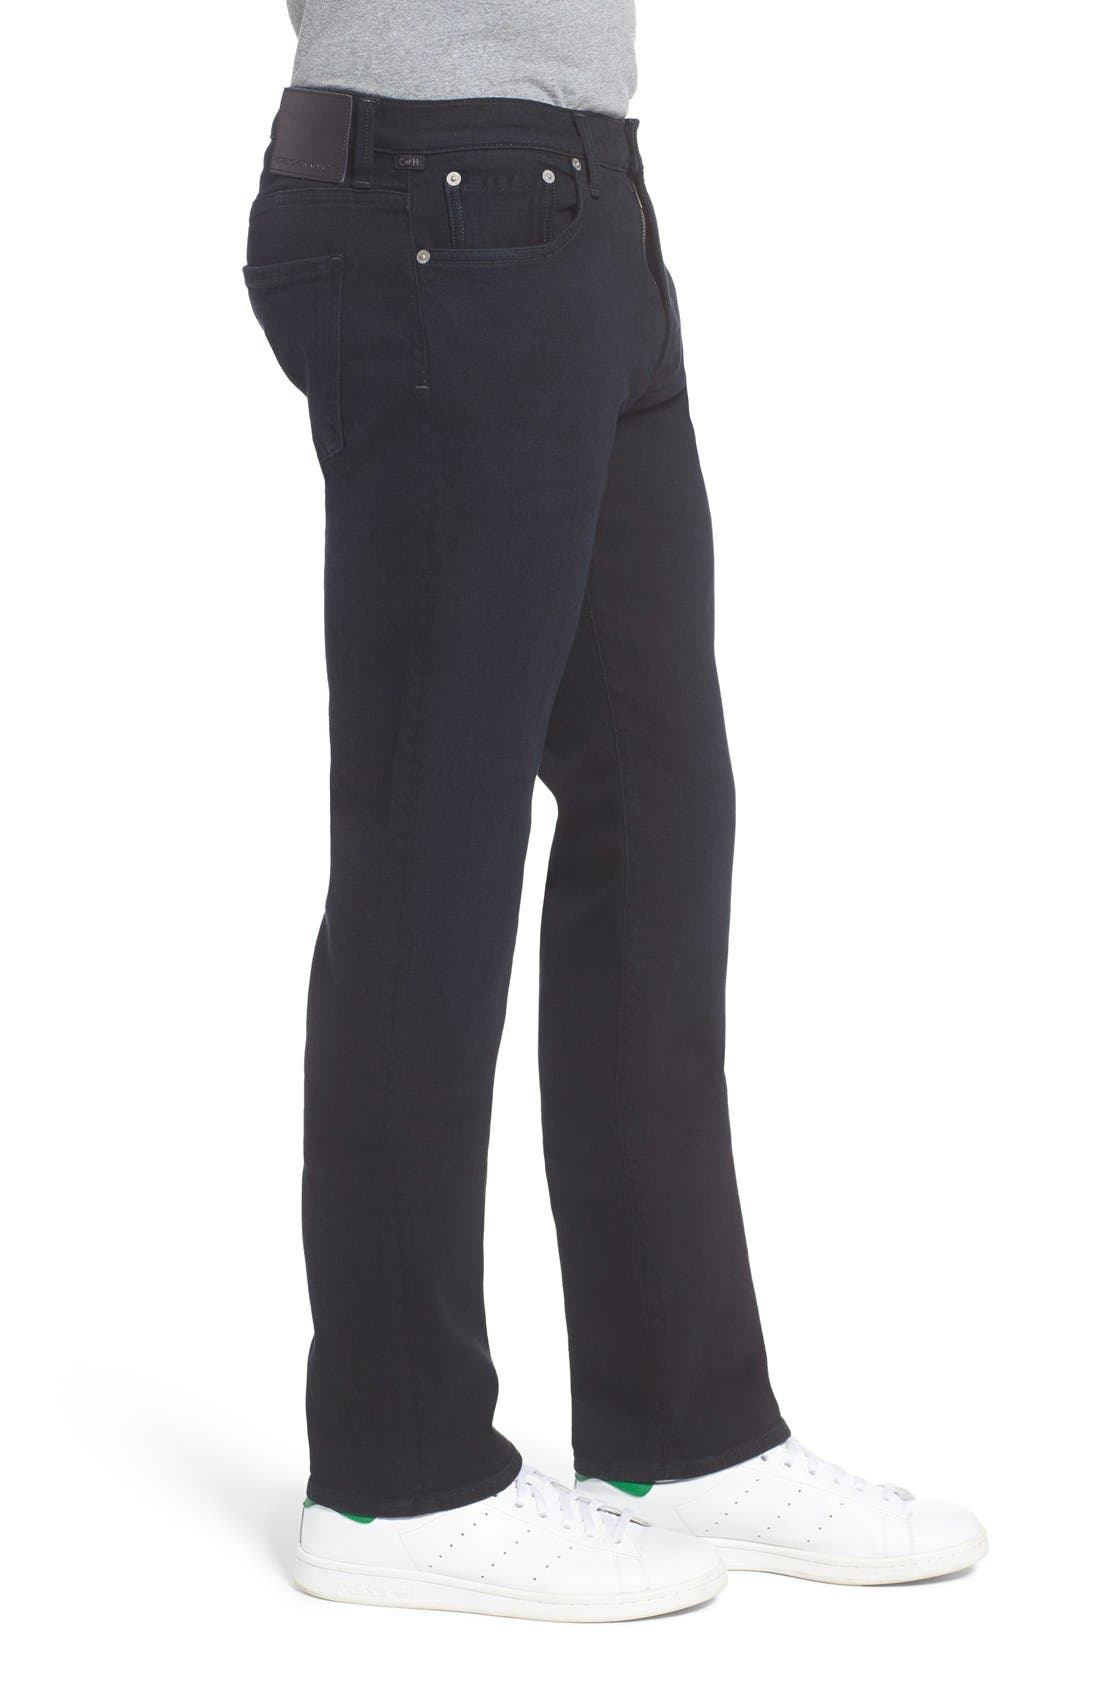 Gage Slim Straight Leg Jeans,                             Alternate thumbnail 9, color,                             401